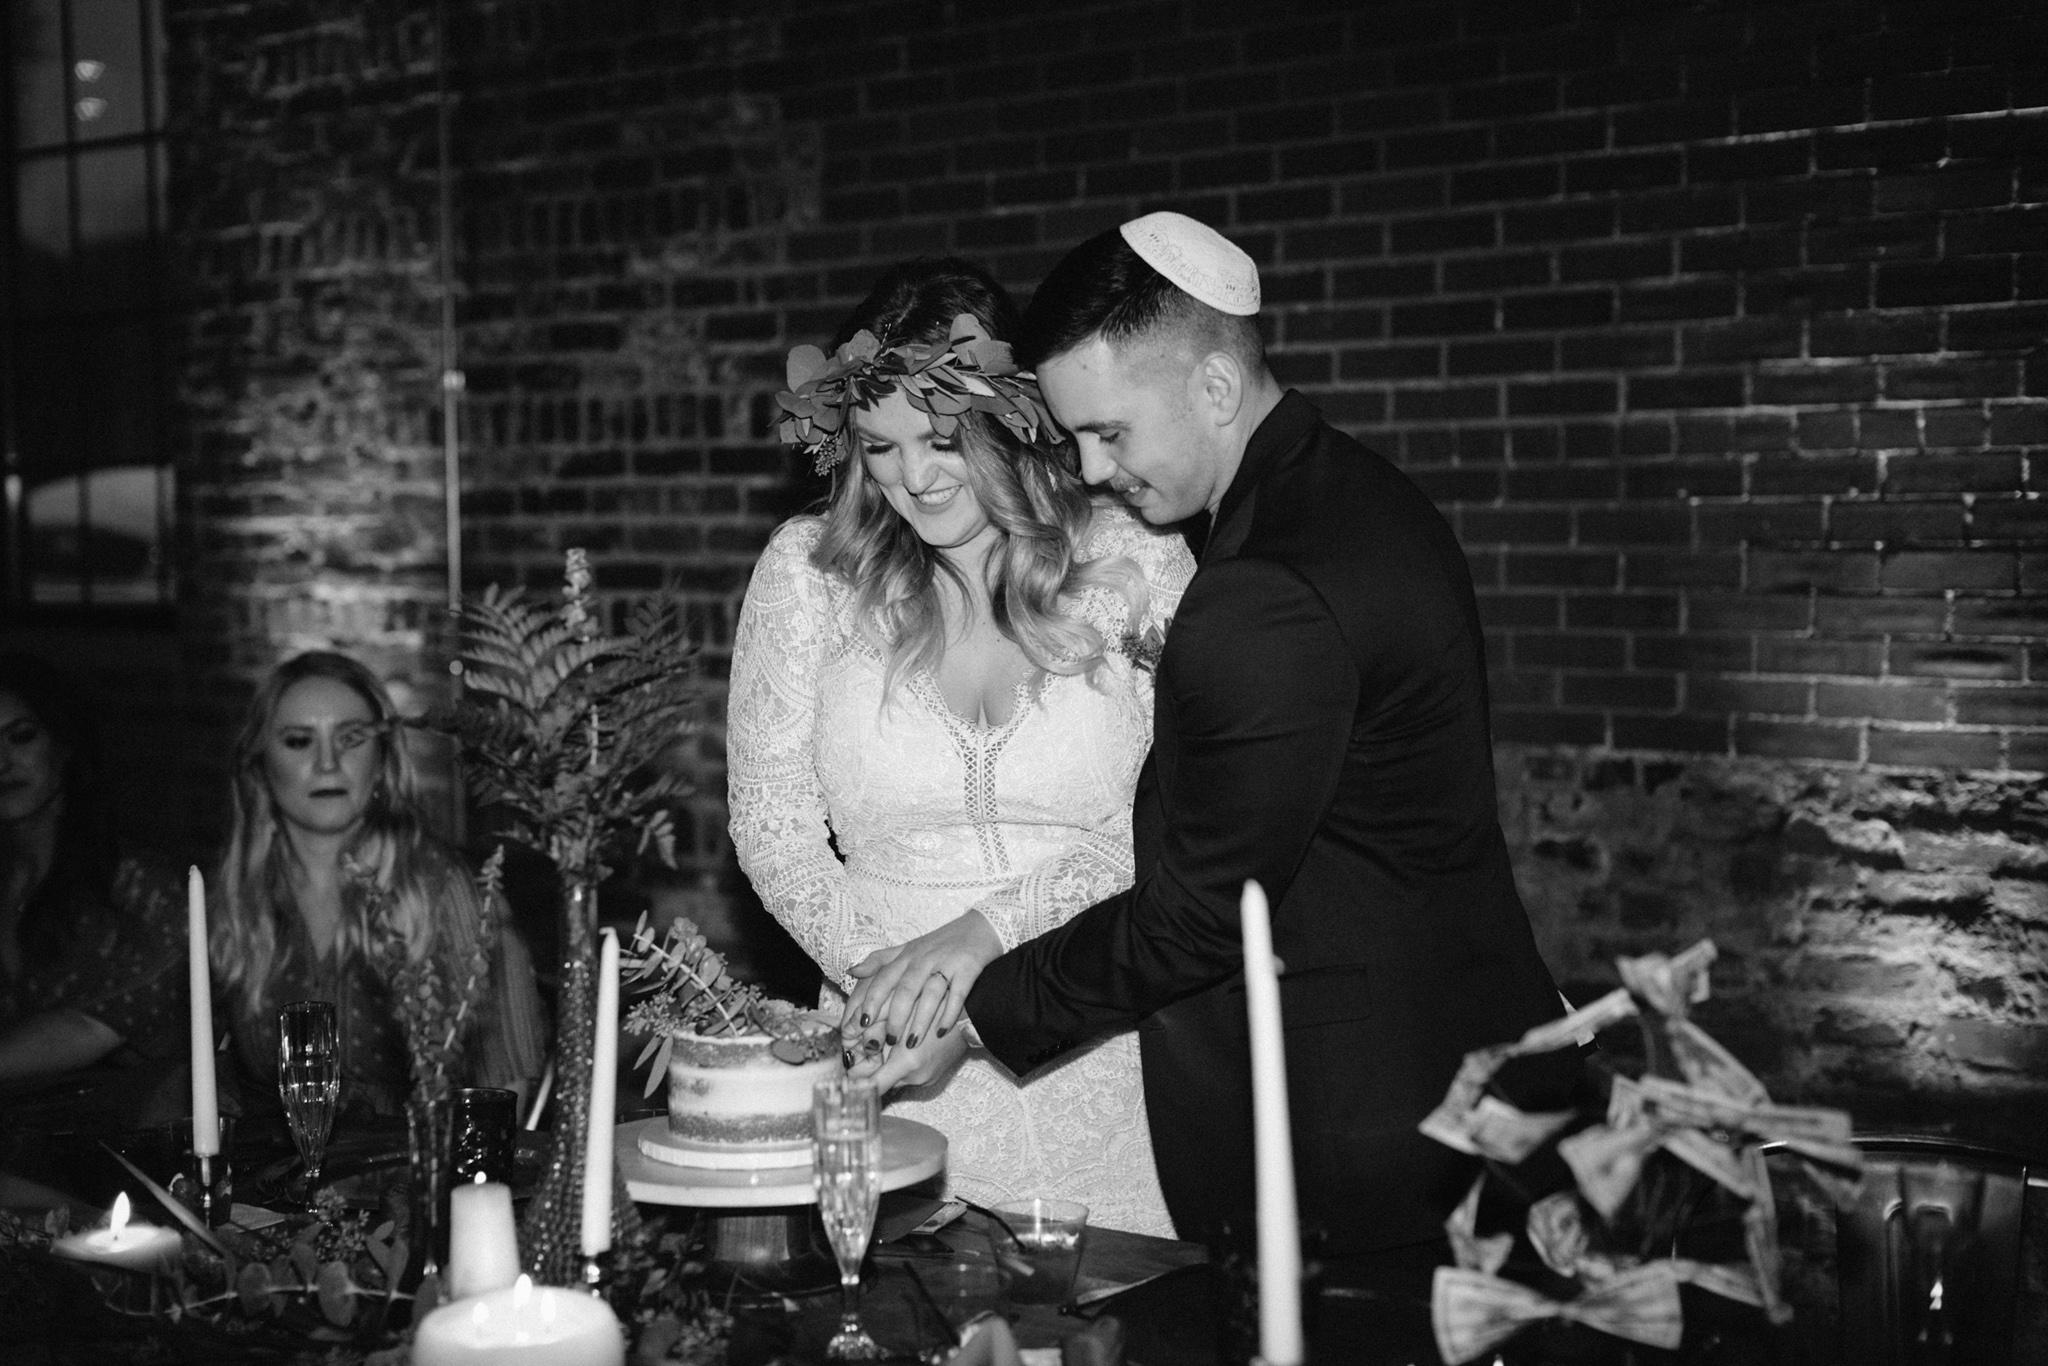 48_19-03-30 Caylen and Max Wedding Previews-97.jpg